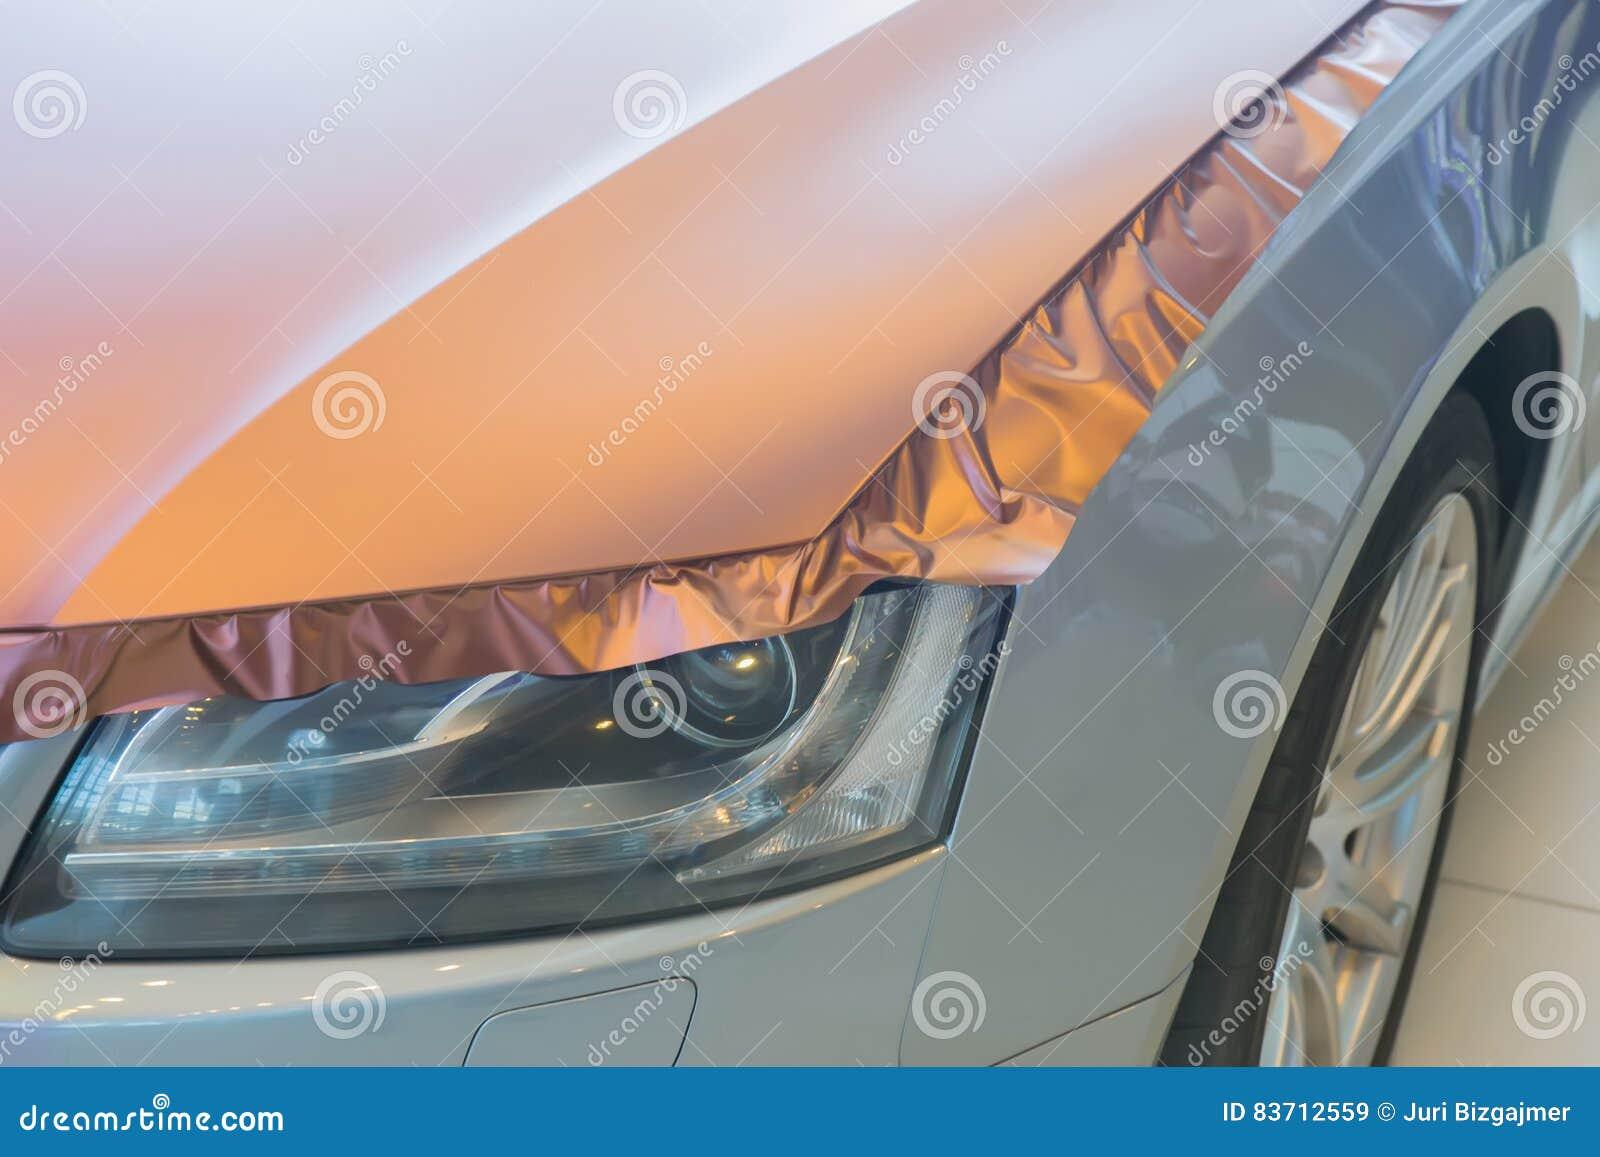 Pasting Of Car Carbonic Plastic Stock Photo